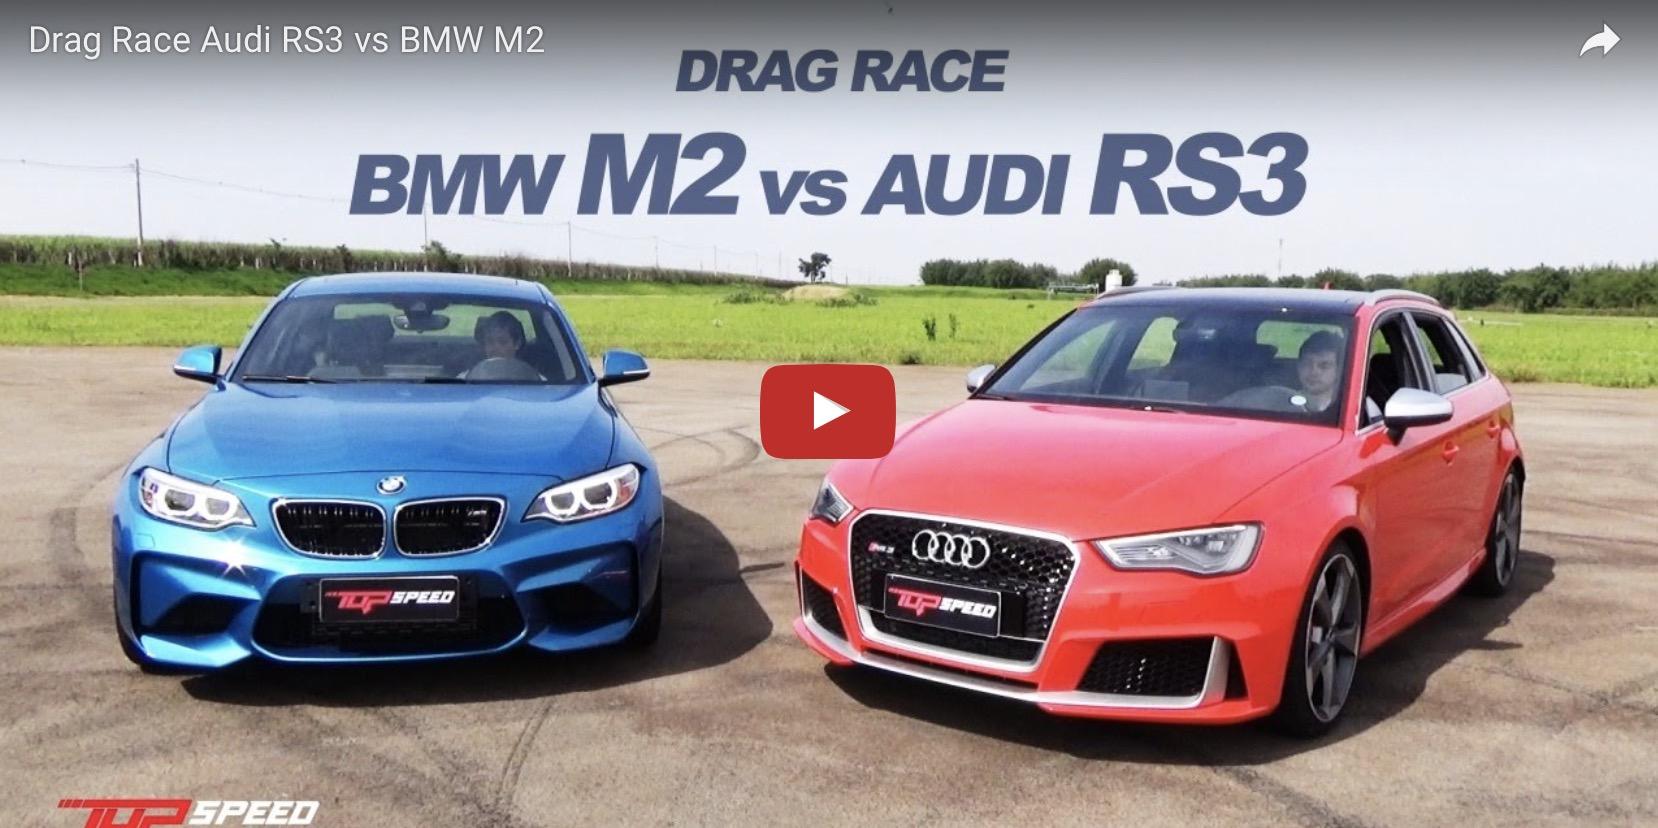 Ddcacdjpg - Audi vs bmw